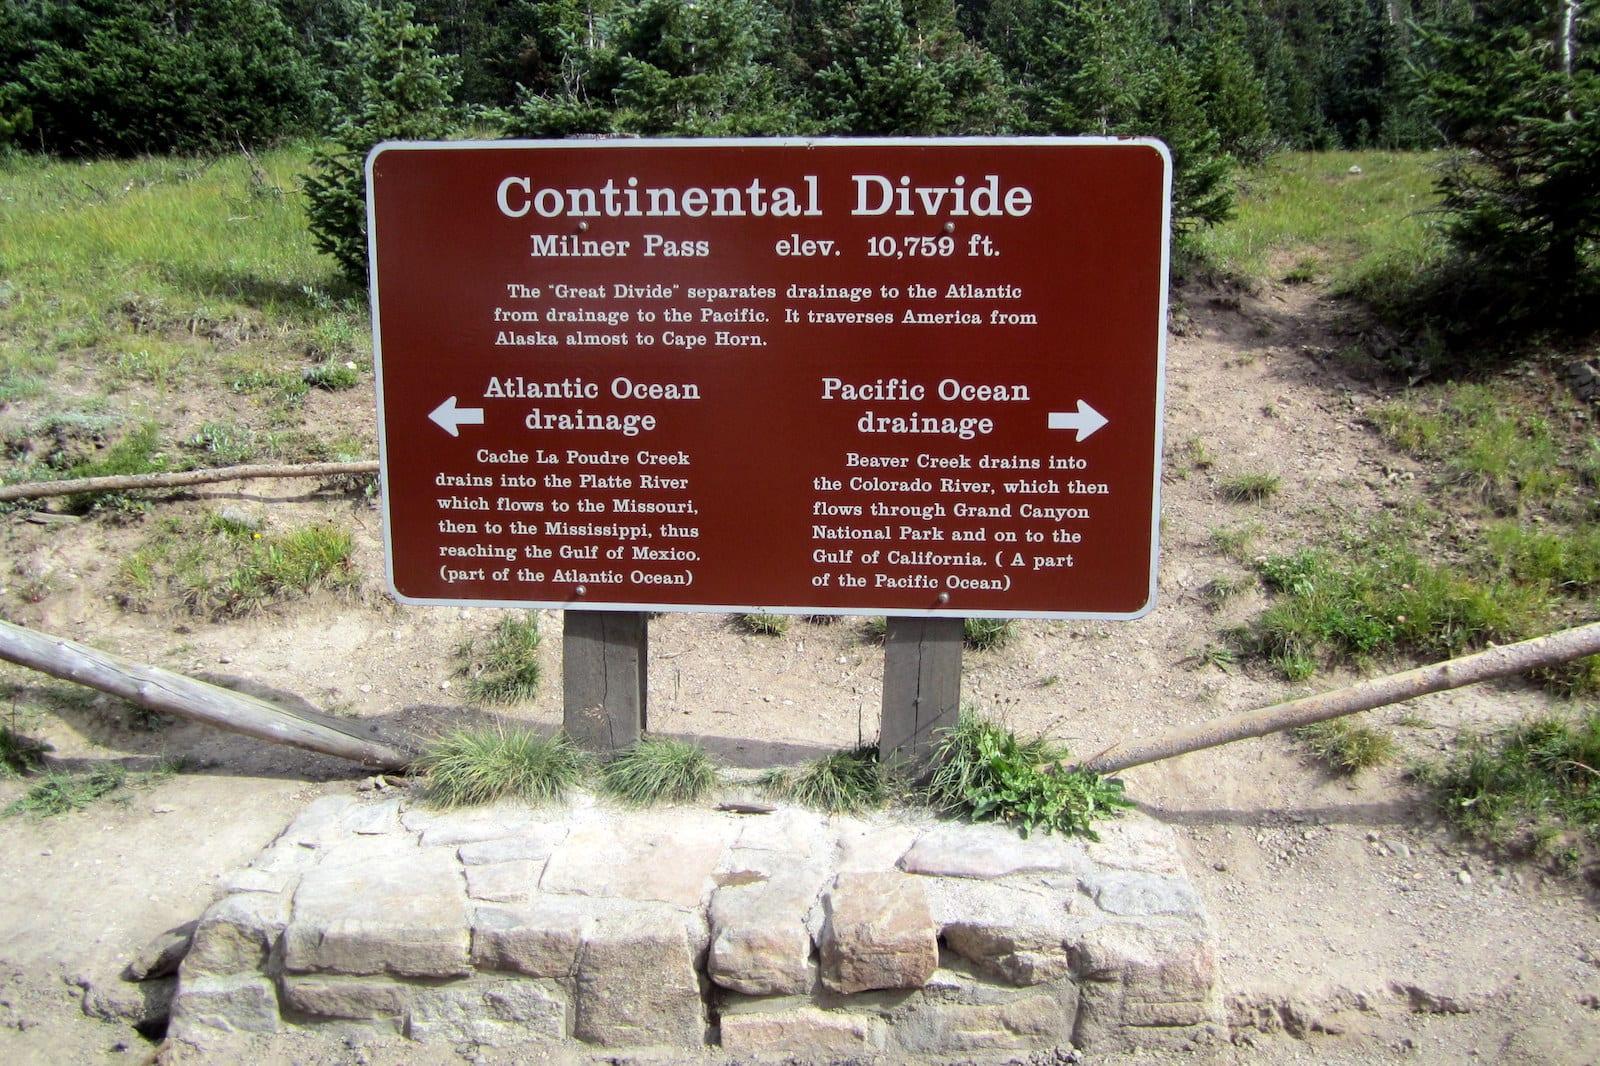 Continental Divide Drainage Sign Milner Pass Colorado